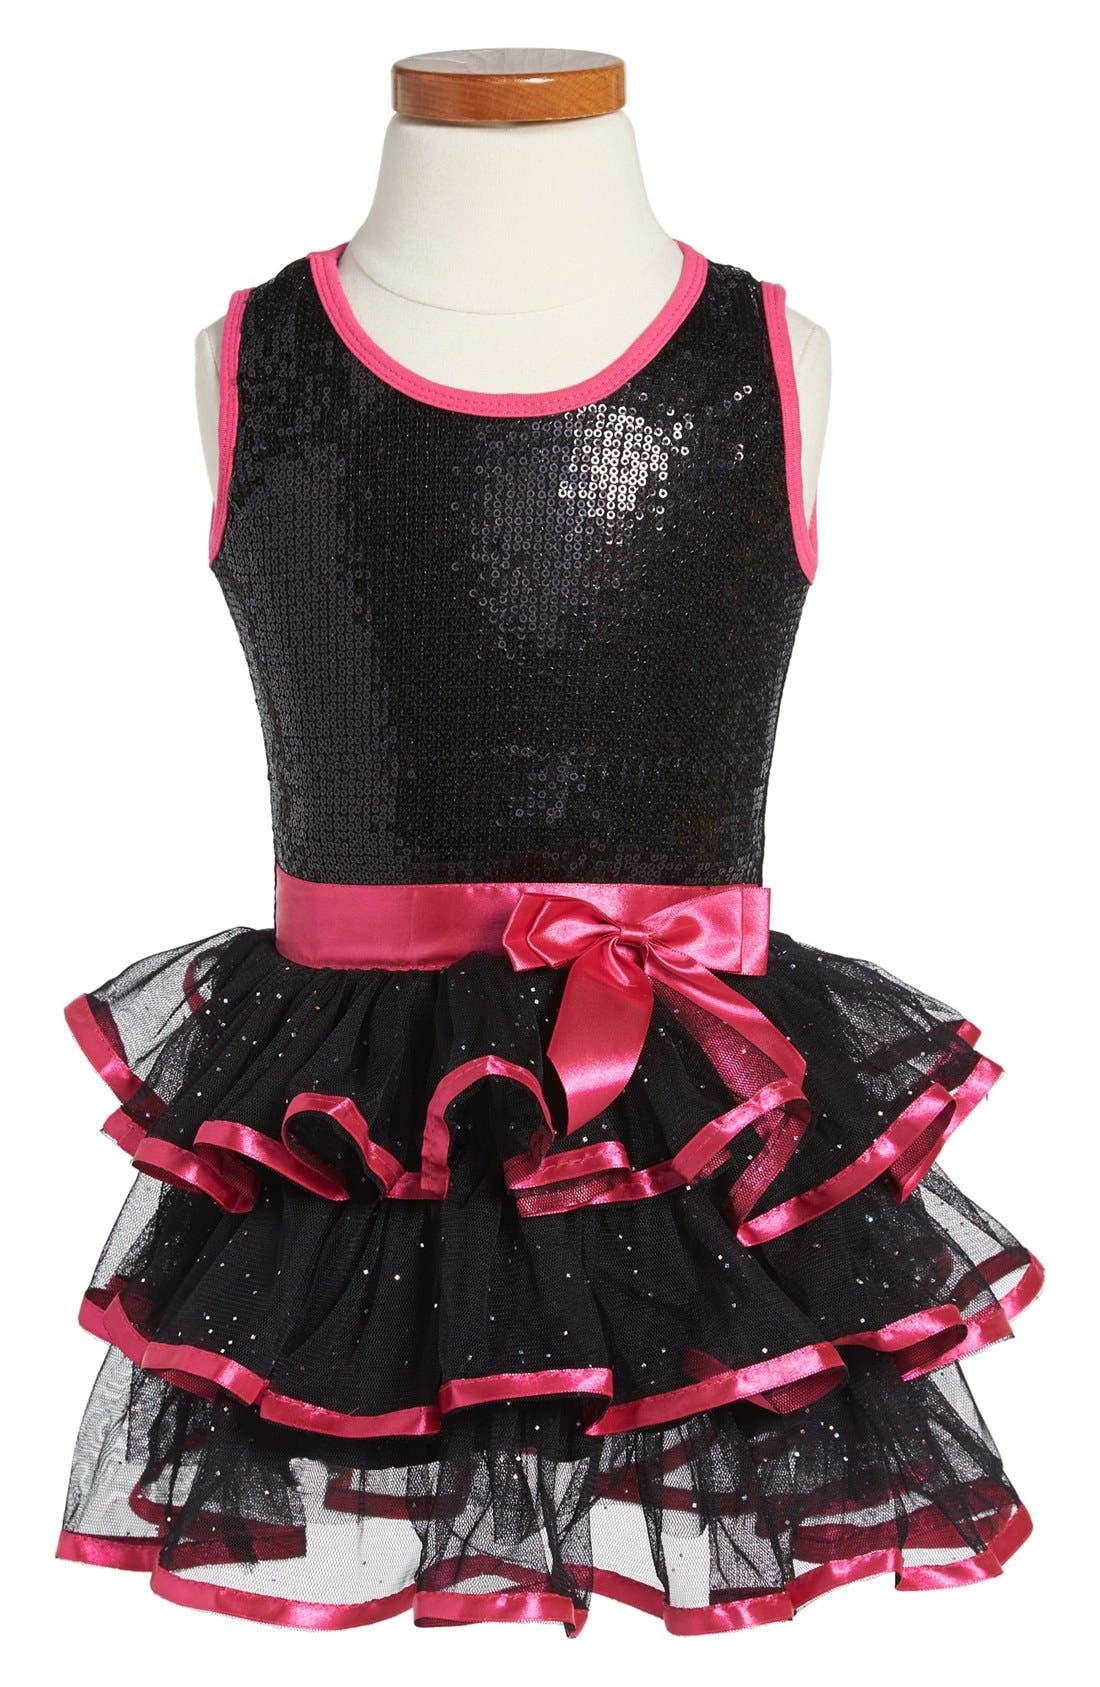 Alternate Image 1 Selected - Popatu Sequin Tiered Skirt Dress (Toddler Girls)